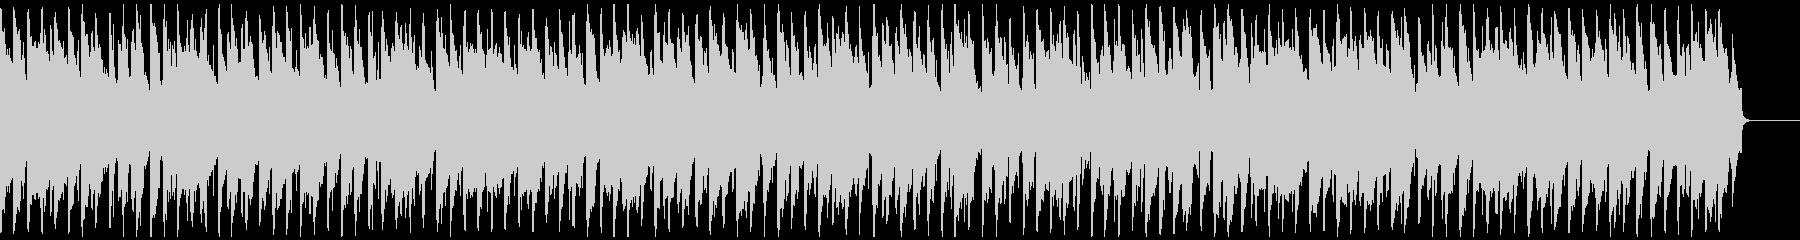 Handel's arrangement for the award ceremony Vertical and snare's unreproduced waveform